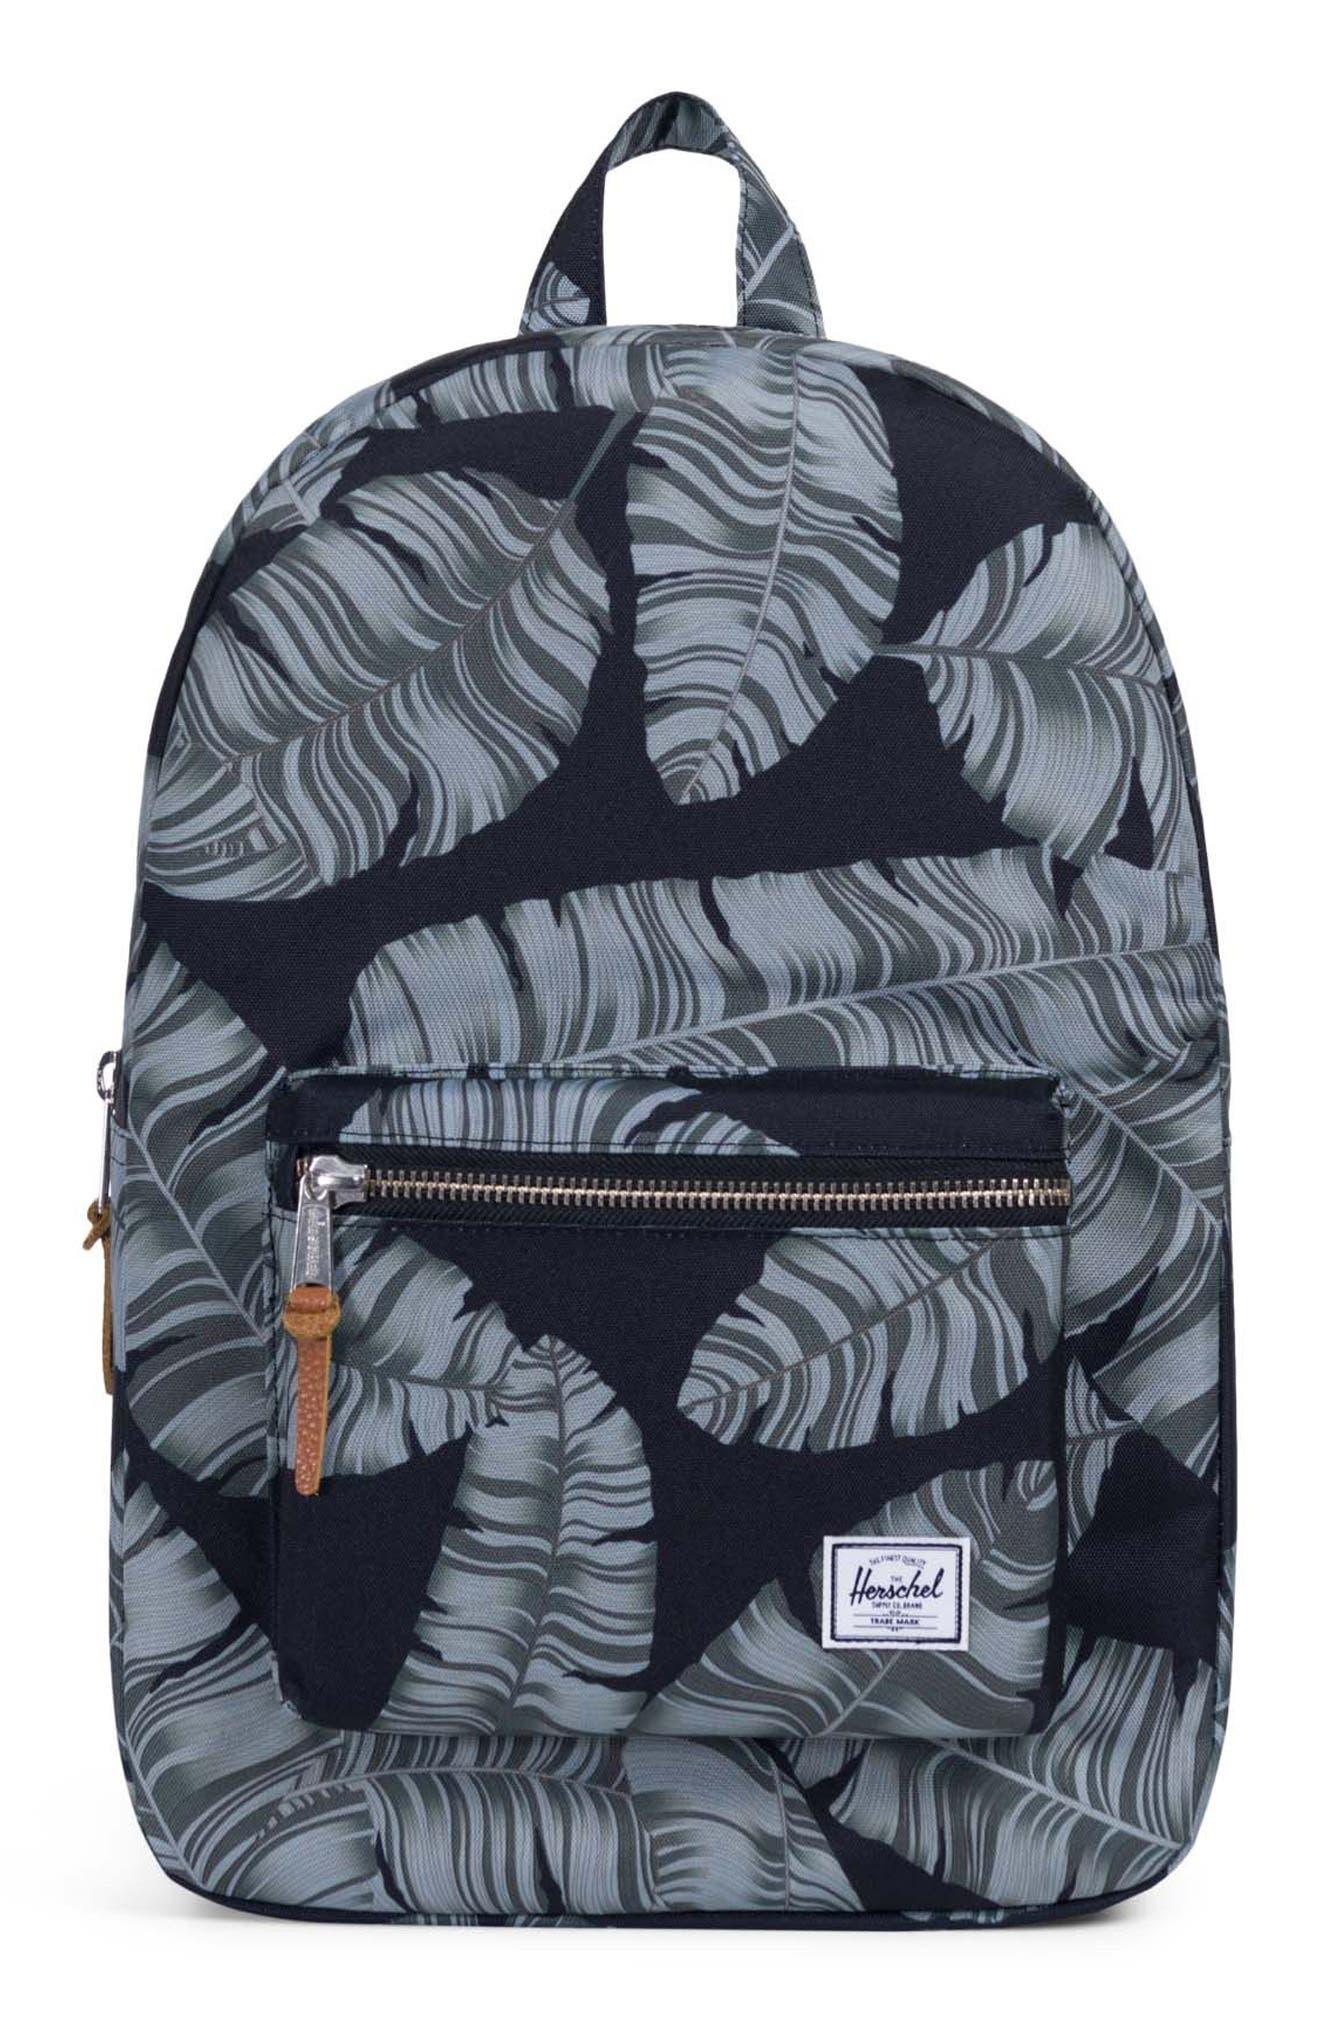 Settlement Aspect Backpack,                         Main,                         color, Black Palm